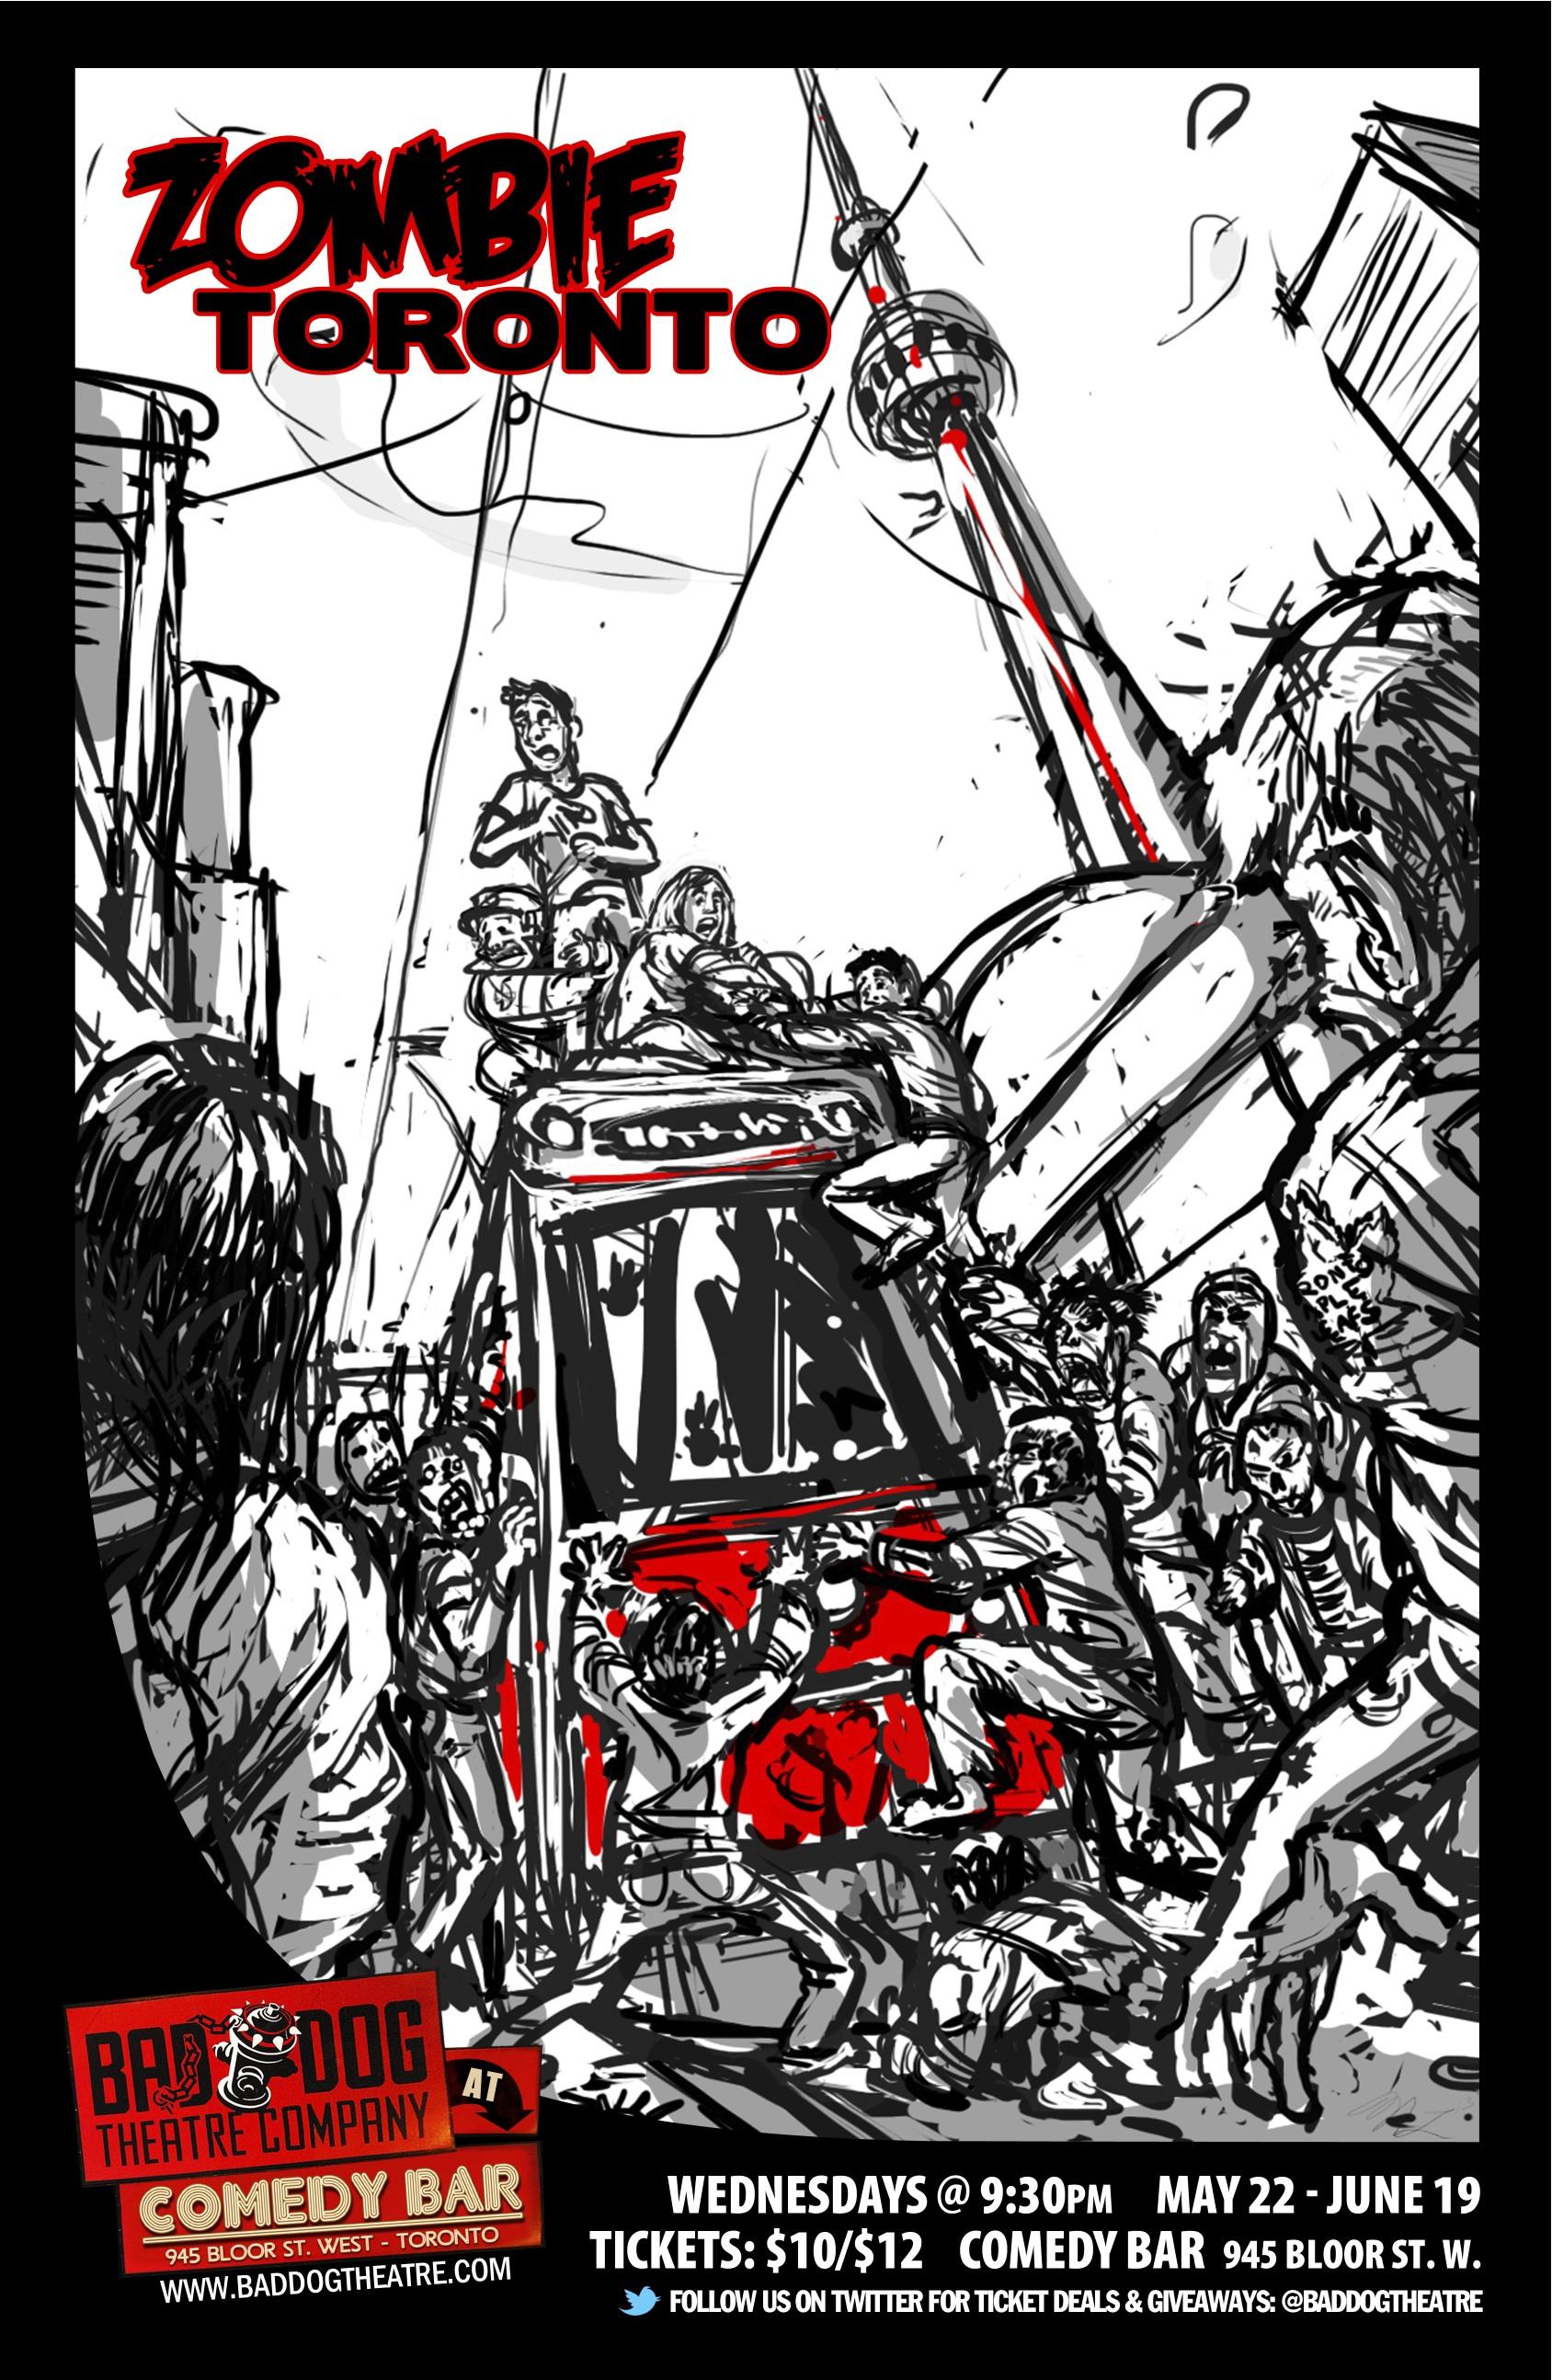 Zombie Toronto poster copy.jpg